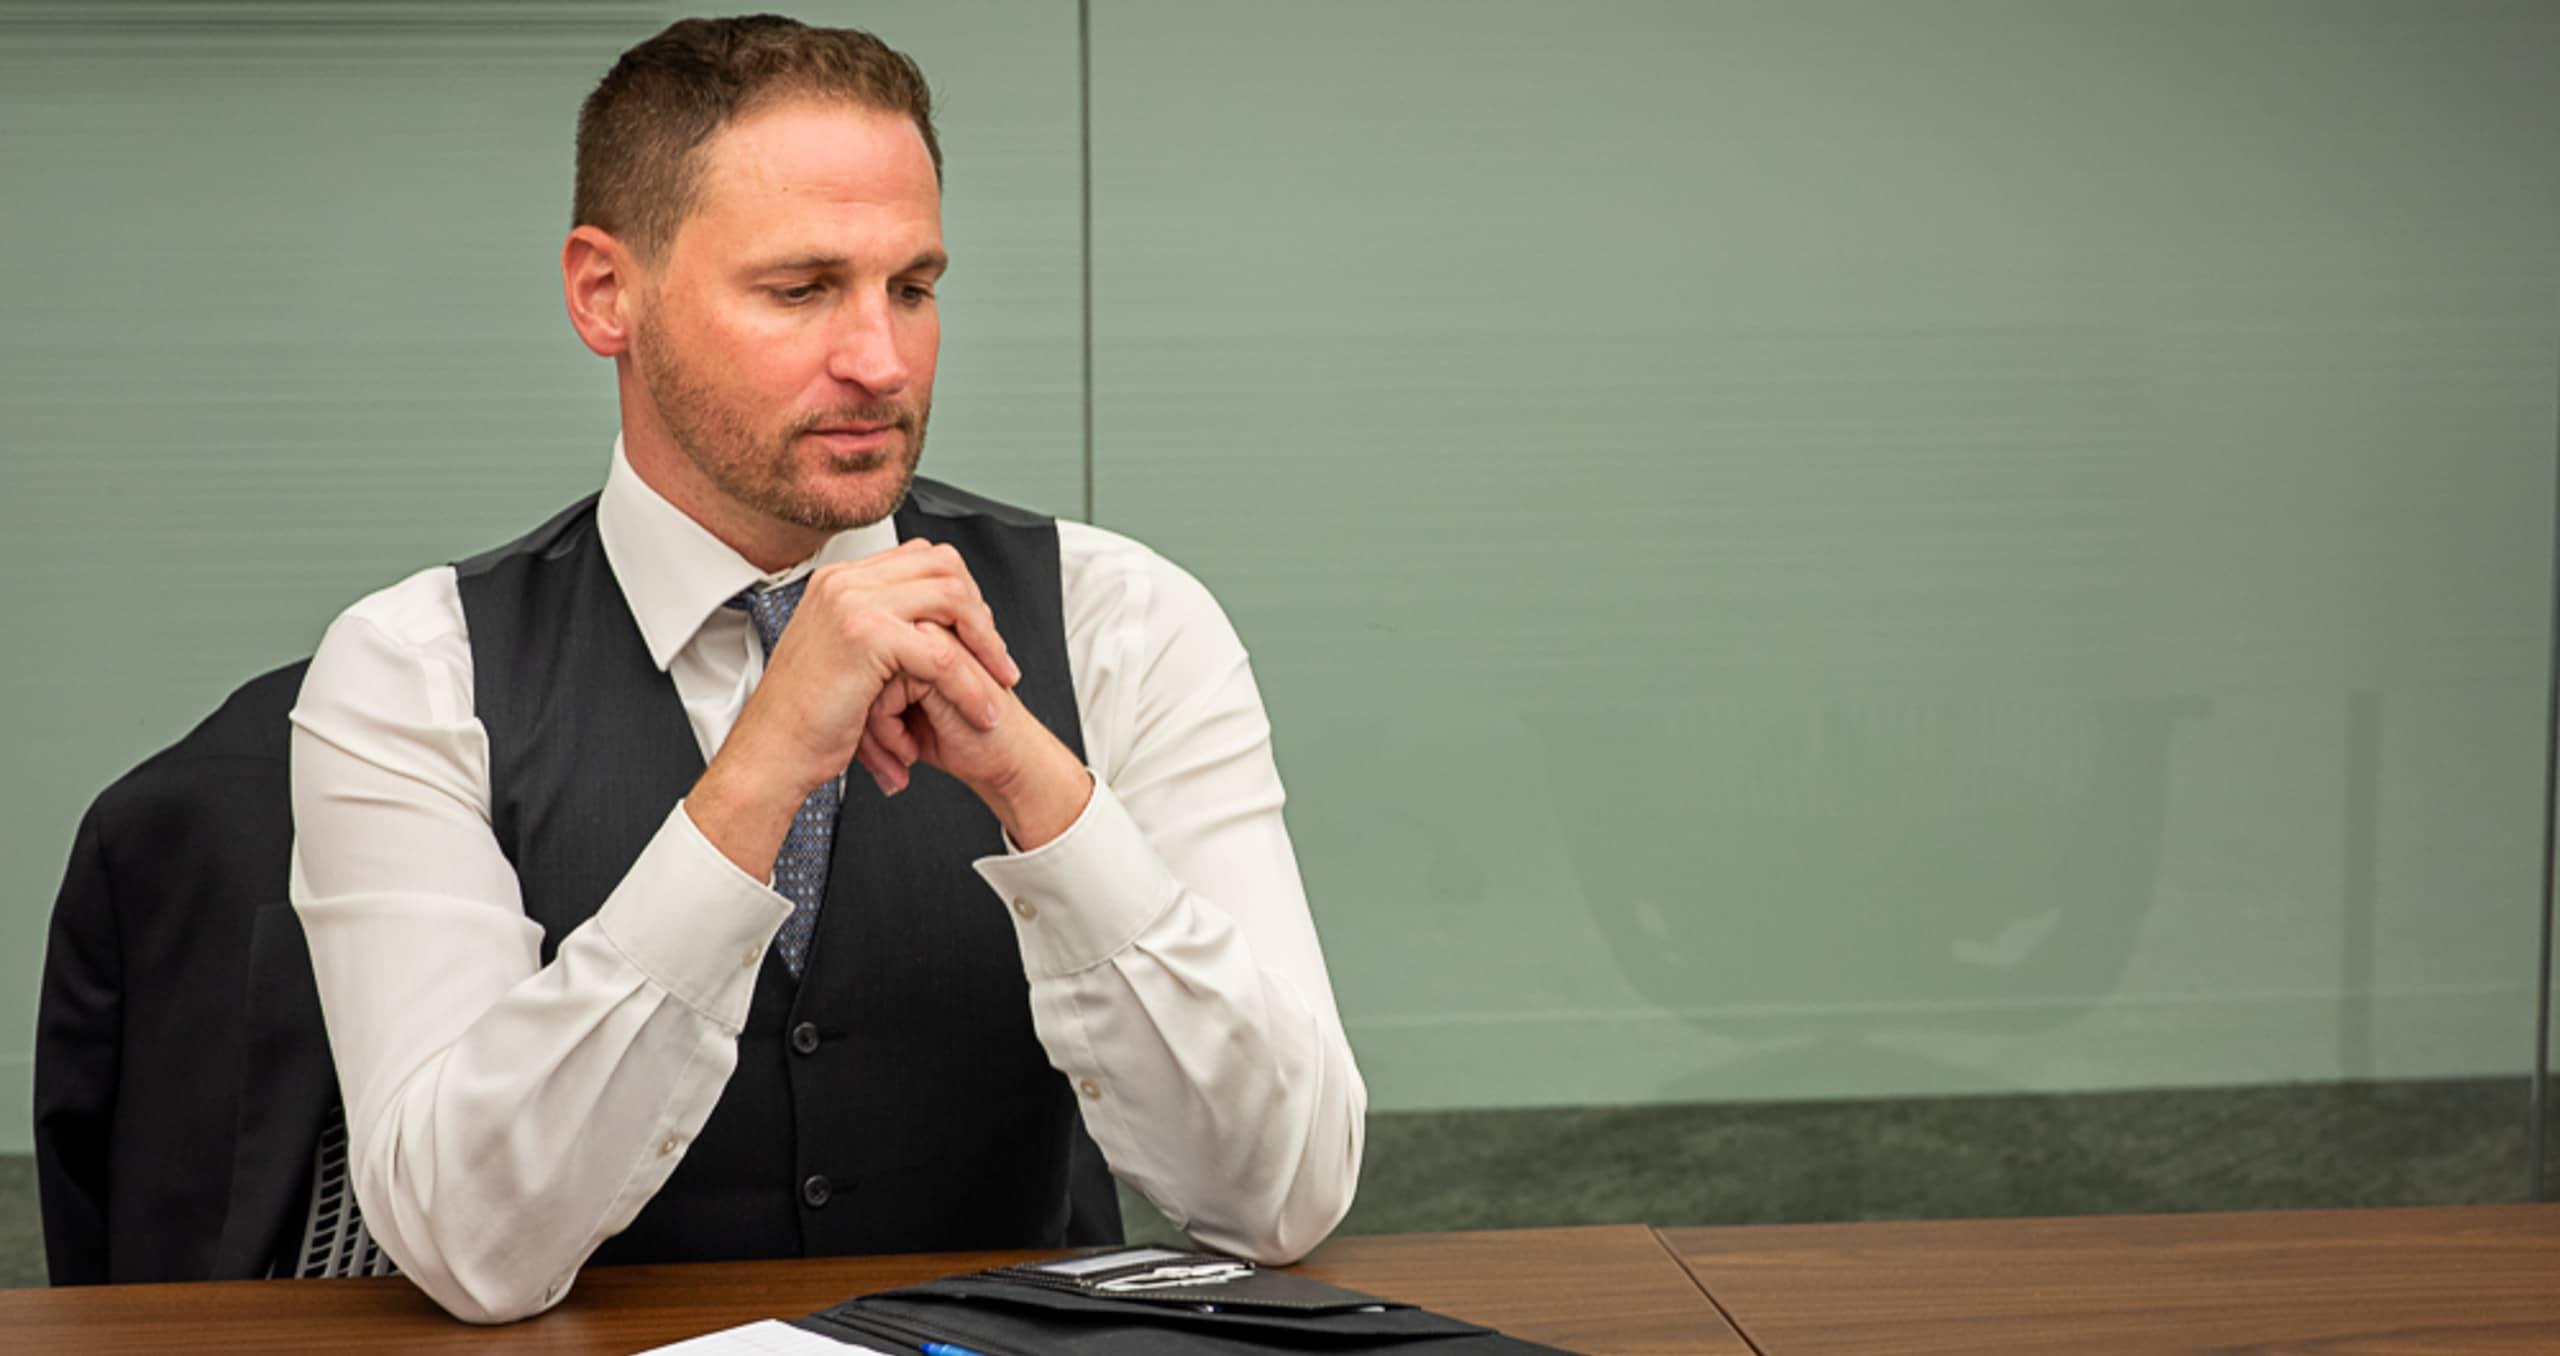 Attorney sitting at desk